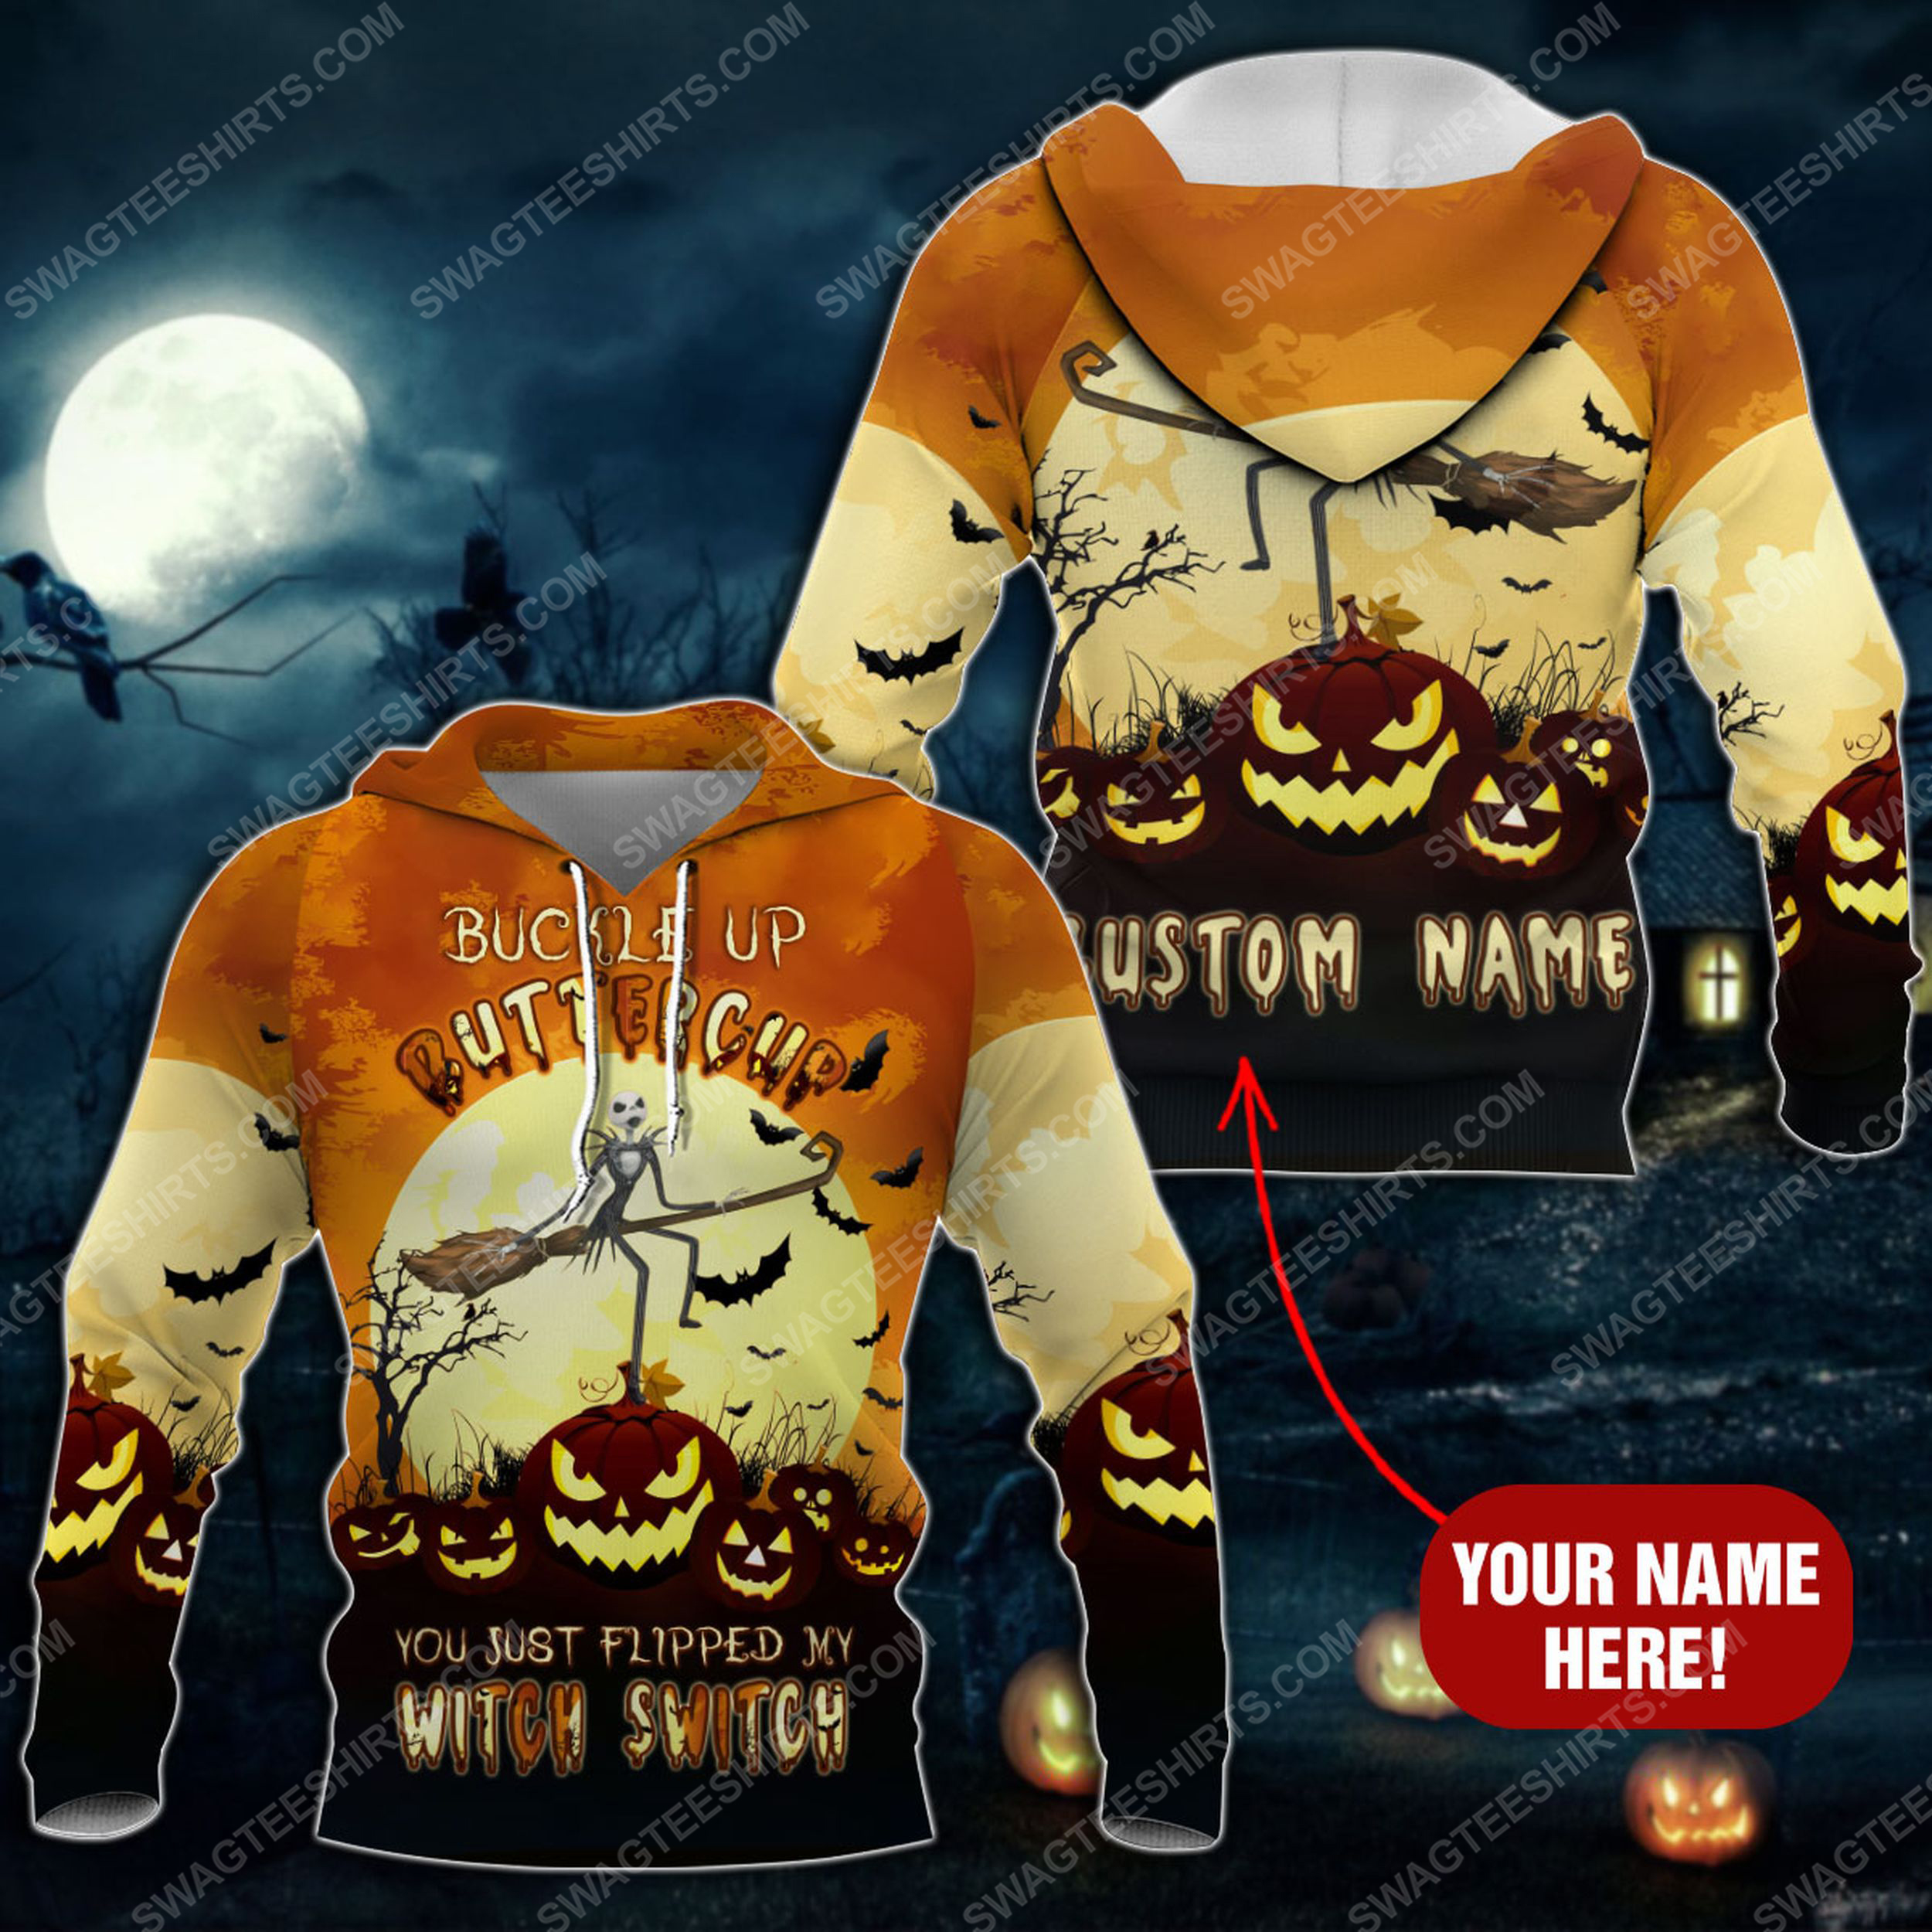 Custom buckle up buttercup you just flipped my witch switch pumpkin halloween shirt 2(1)